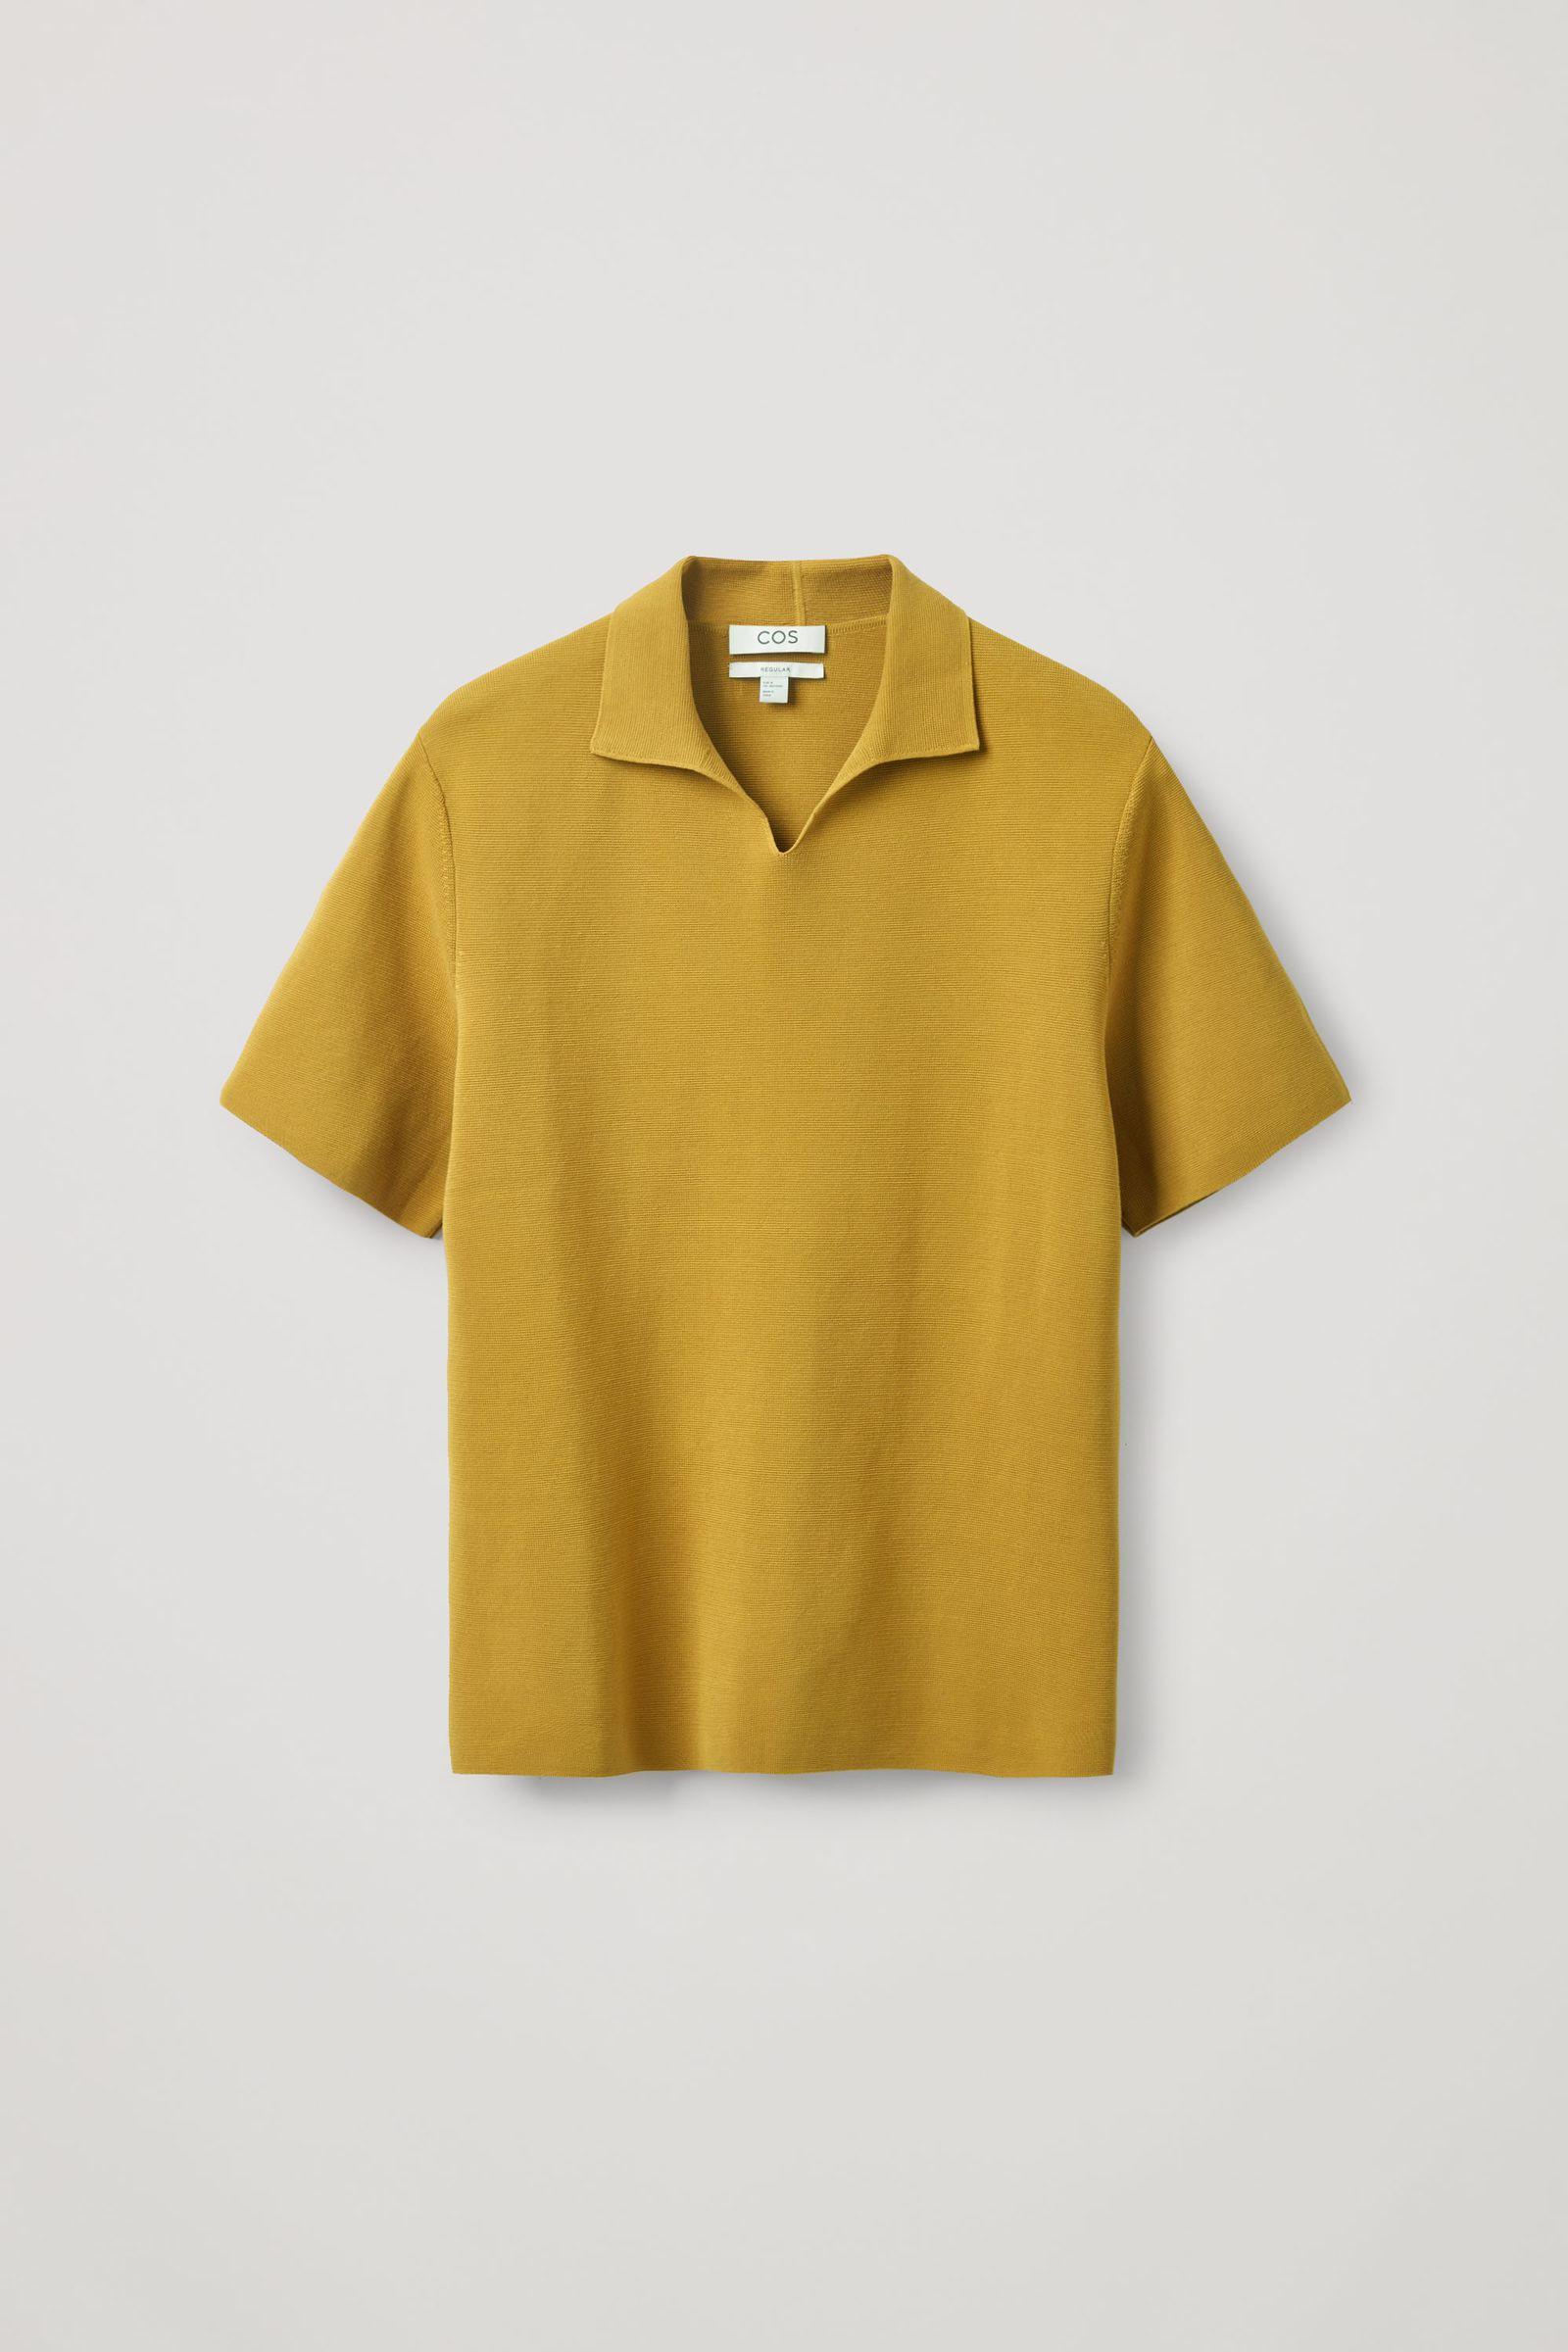 COS 오픈 칼라 폴로 셔츠의 머스타드 옐로우컬러 Product입니다.